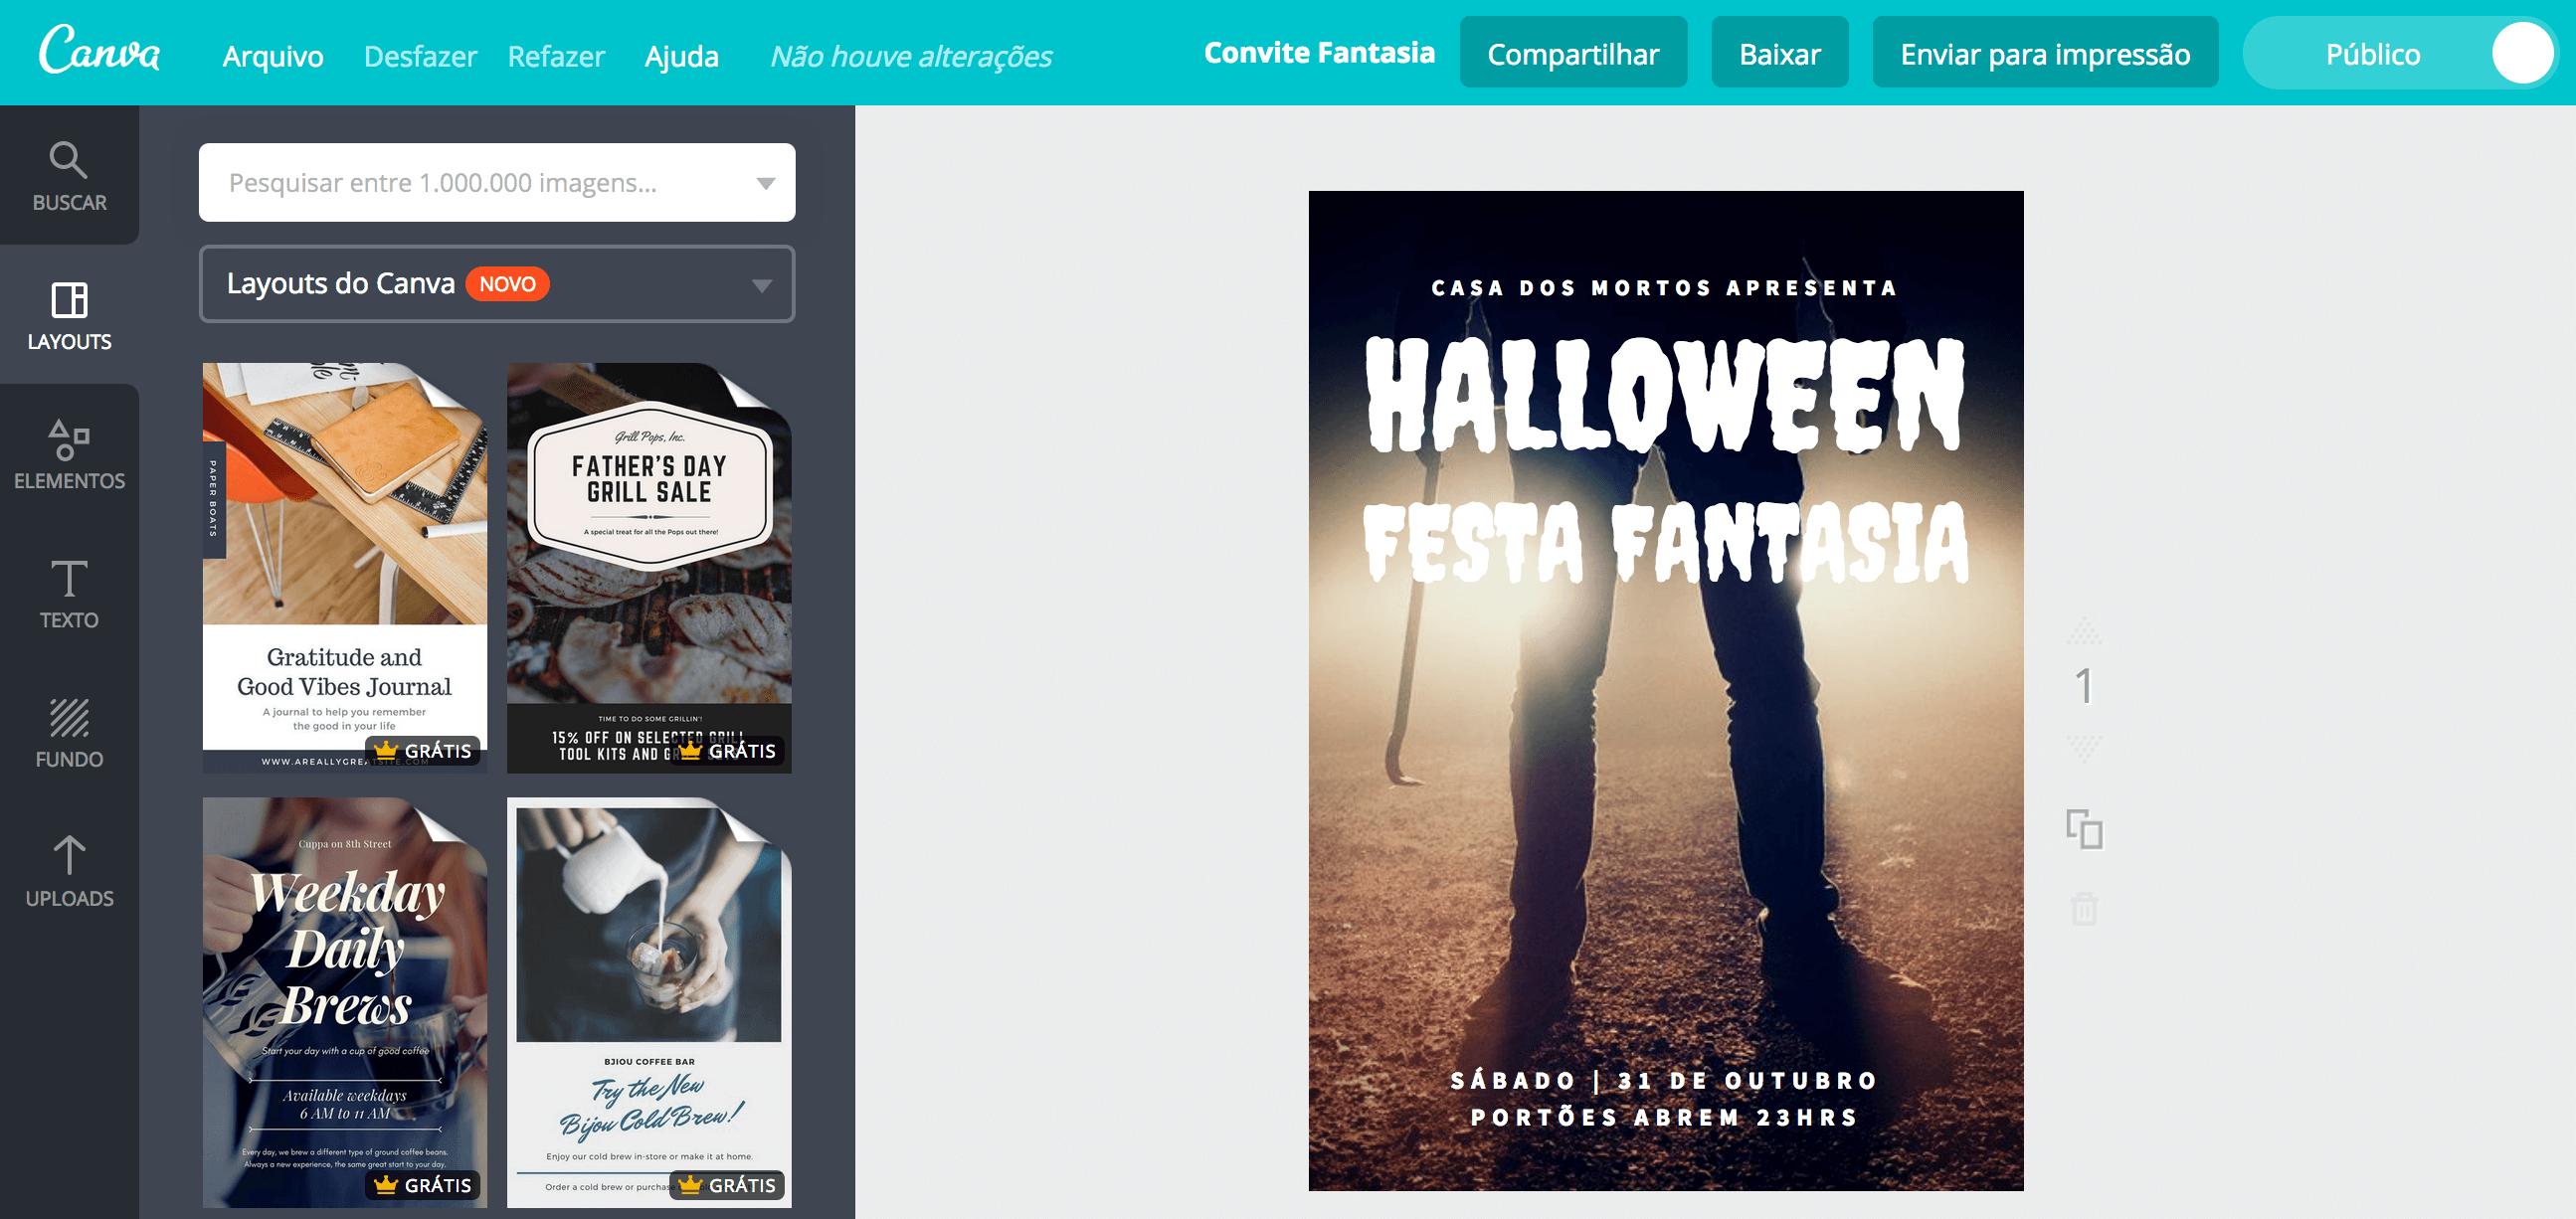 Criar Convite Para Festa à Fantasia Online Canva